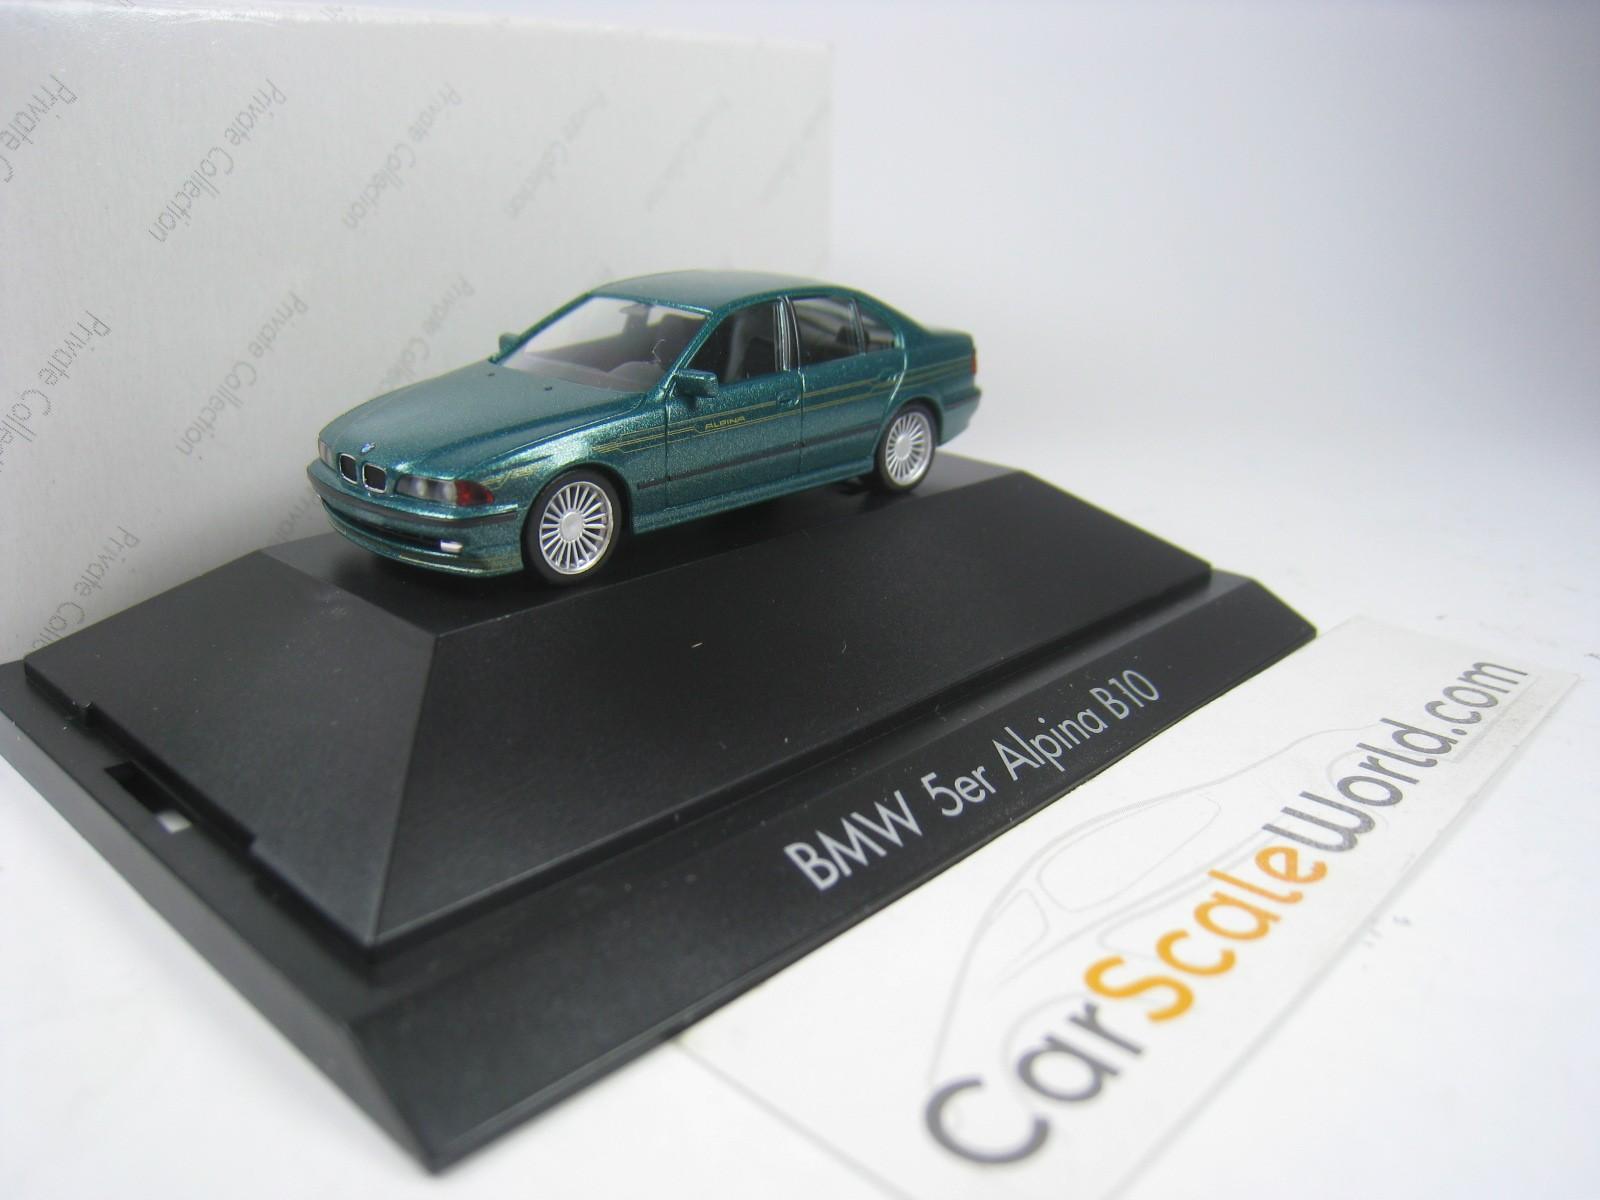 Alpina B10 Bmw 5 Series E39 1 87 Herpa Green Carscaleworld